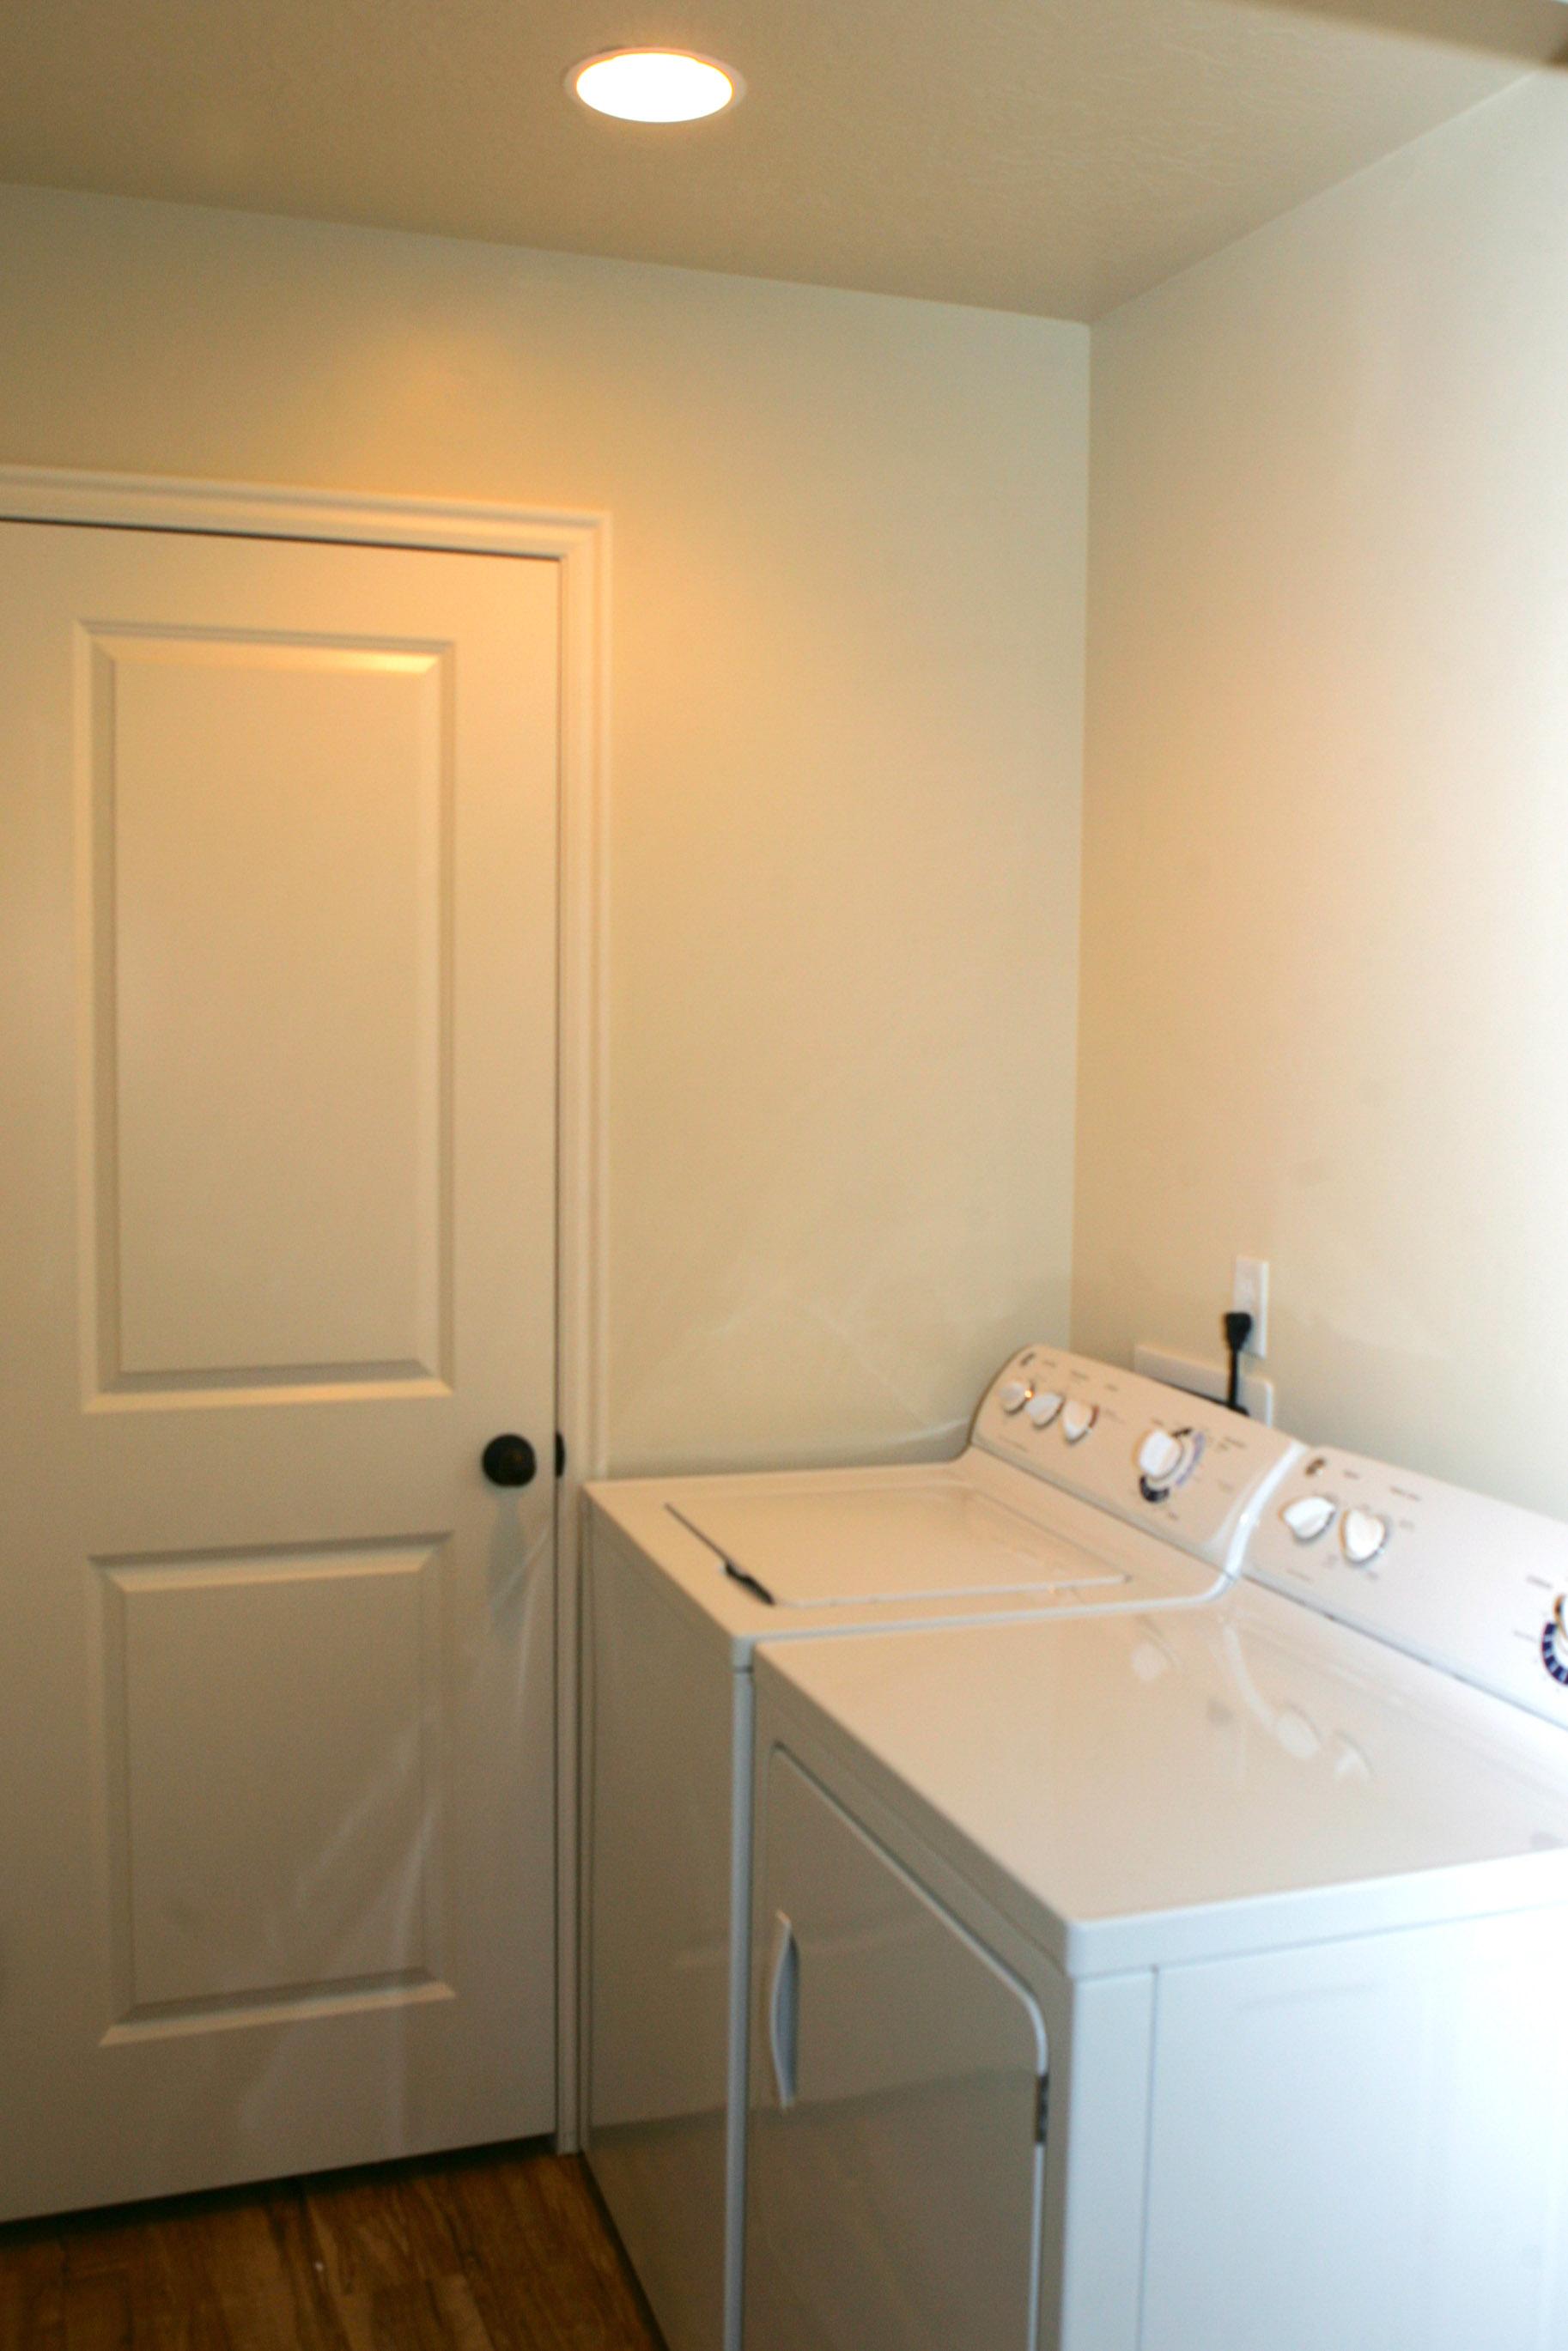 byu students laundry facility.jpg